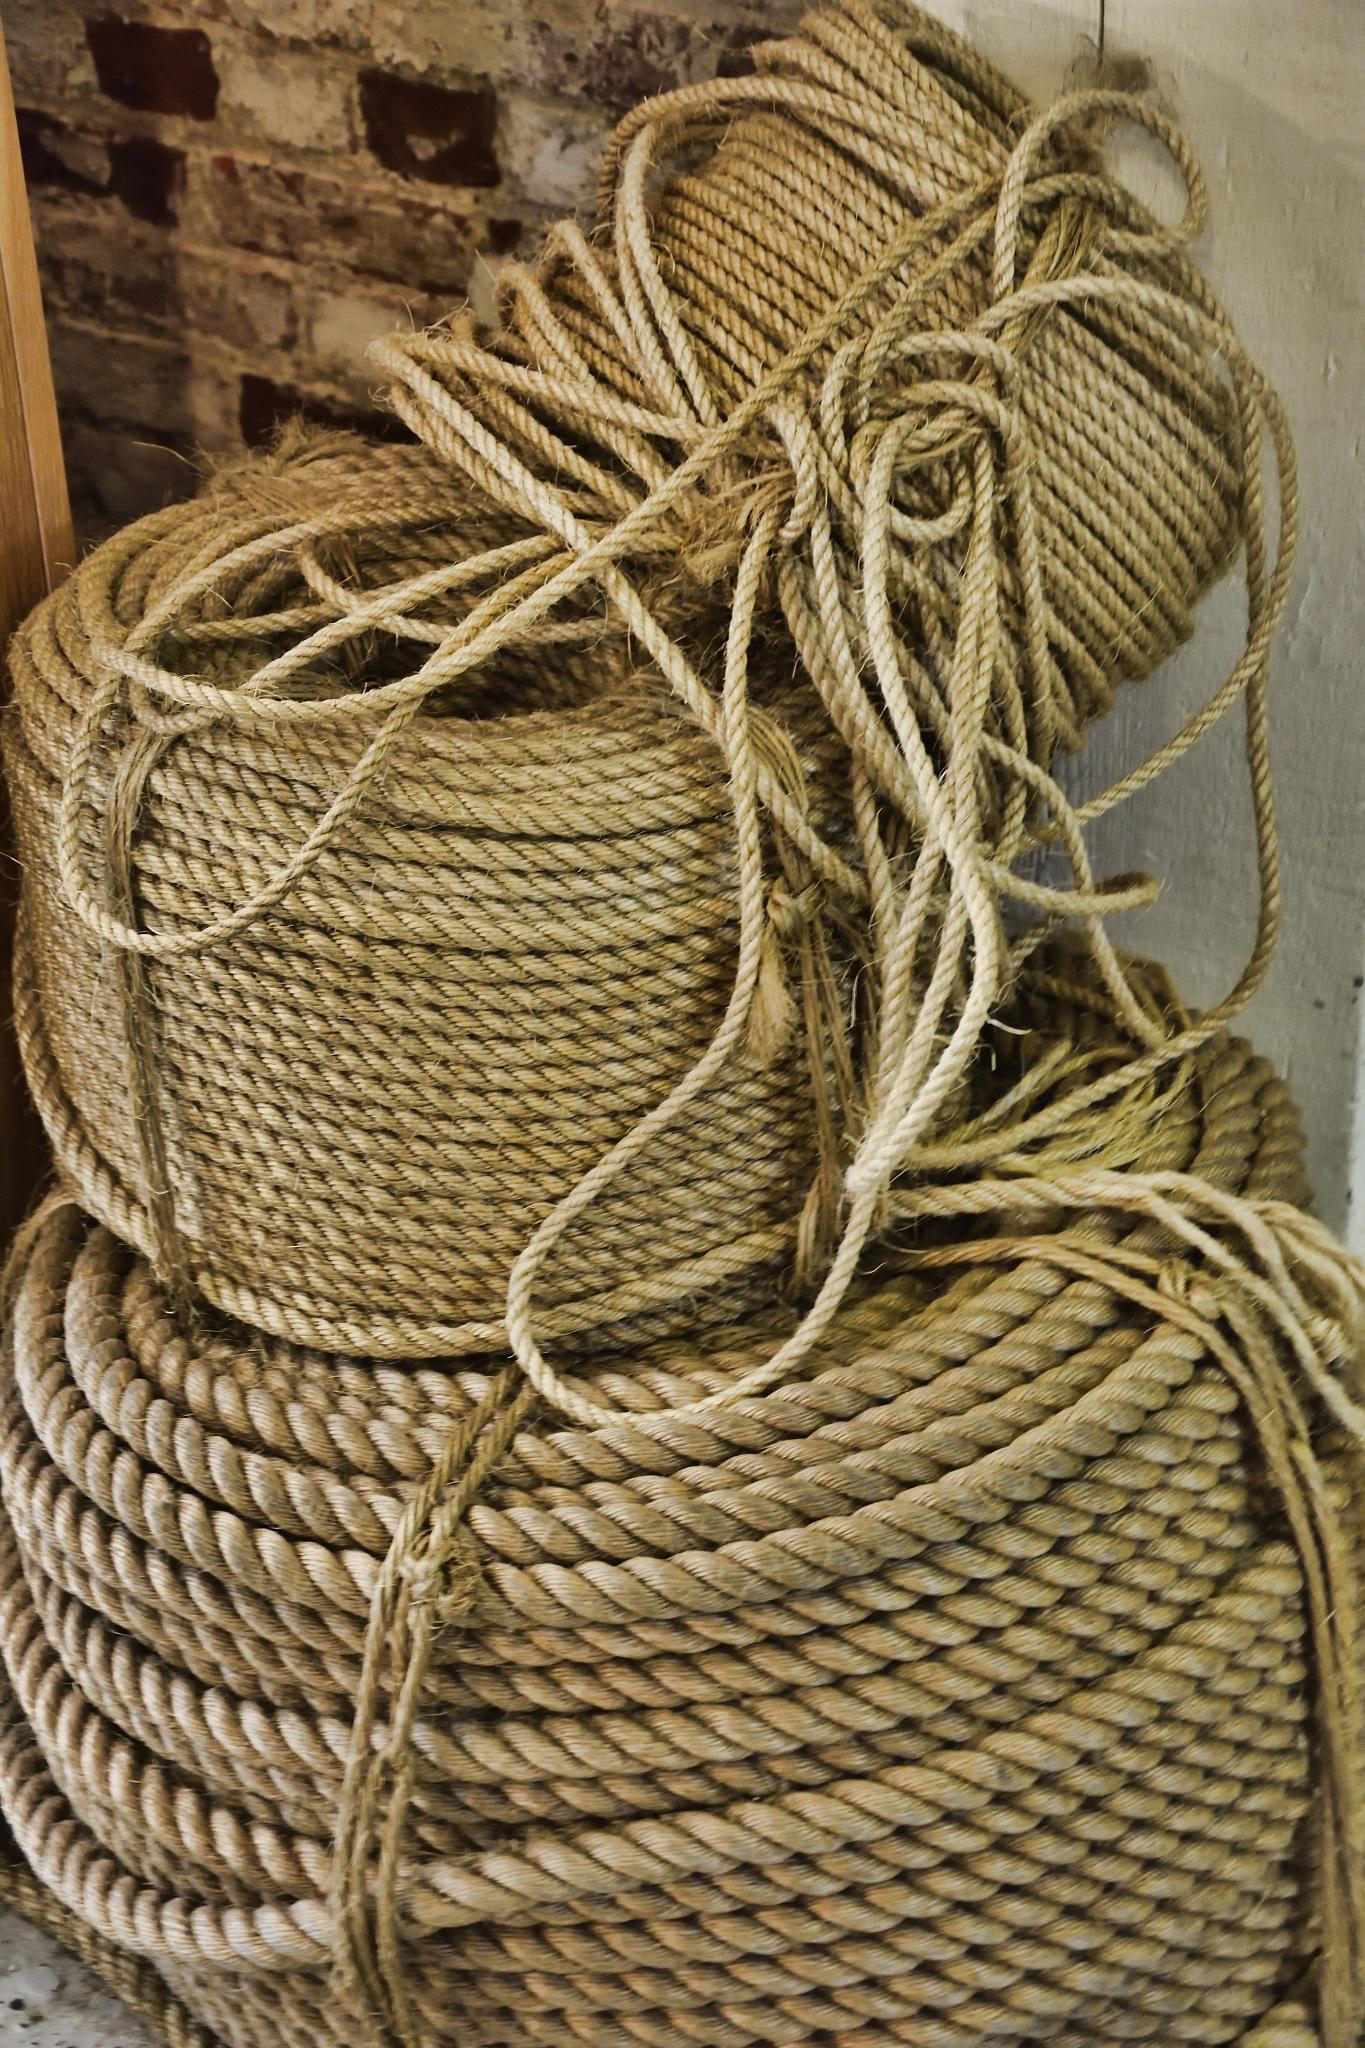 Rope Factory by Derek Clarke